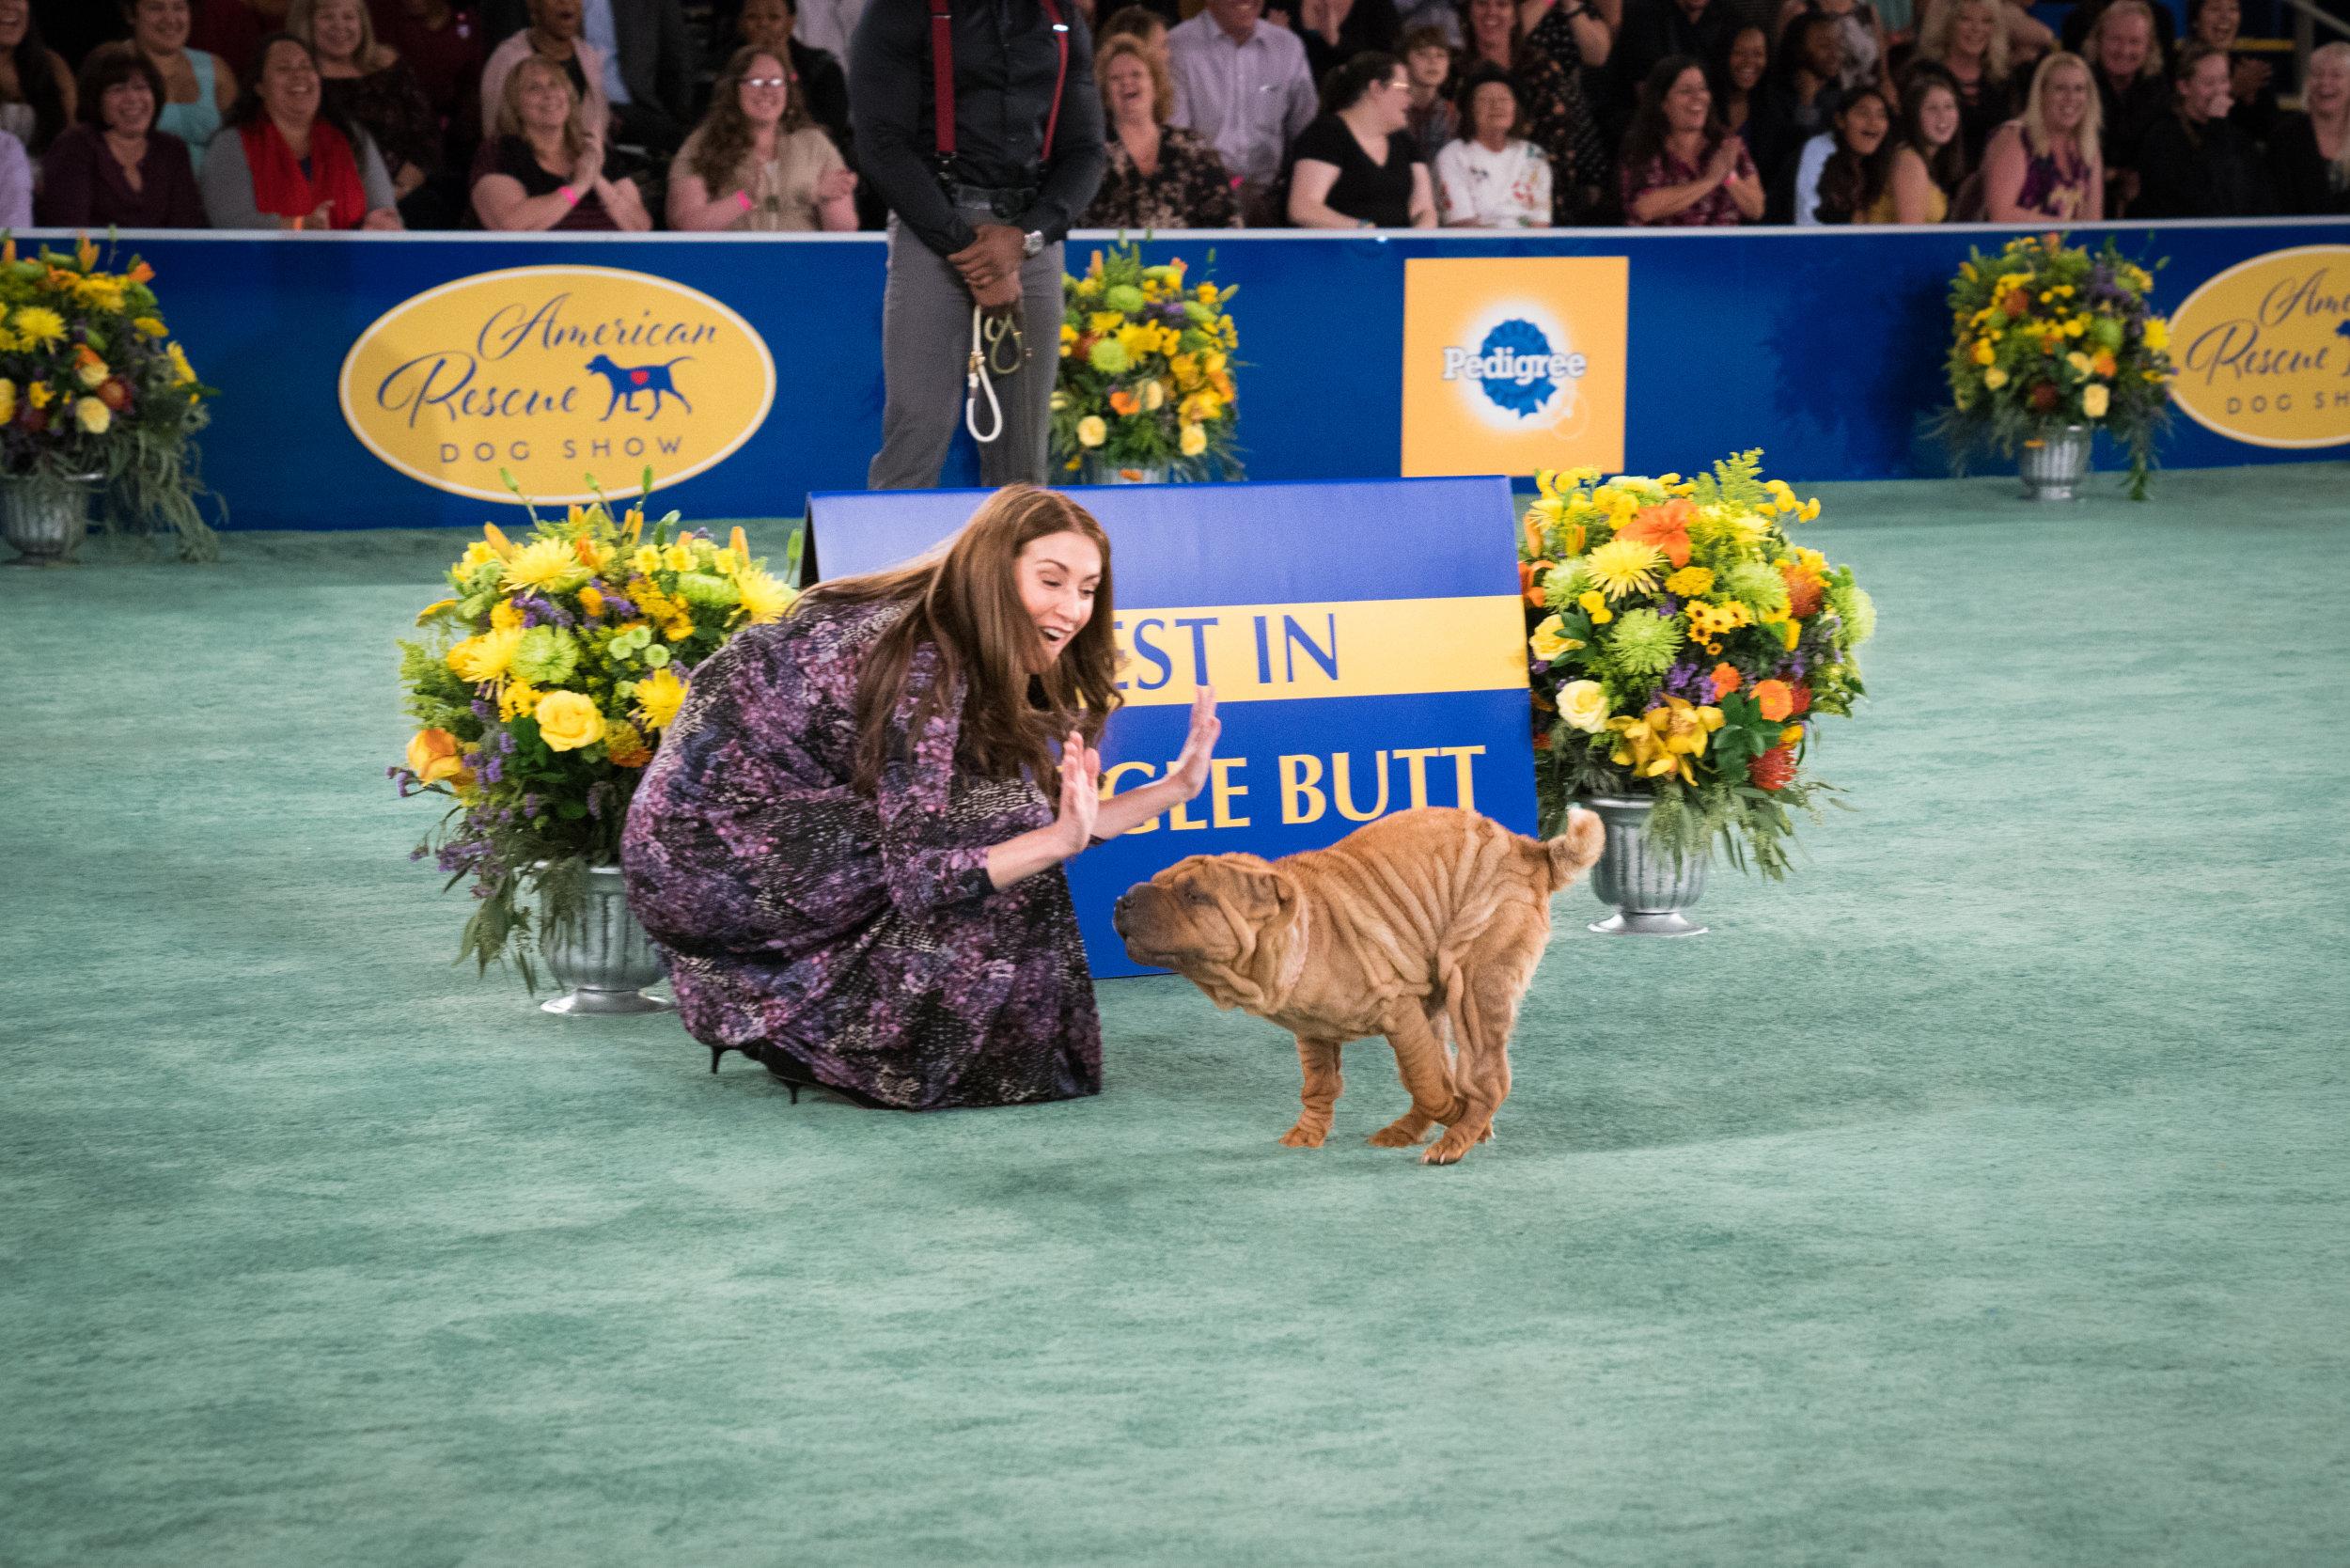 American Rescue Dog Show The Winners Hallmark Channel